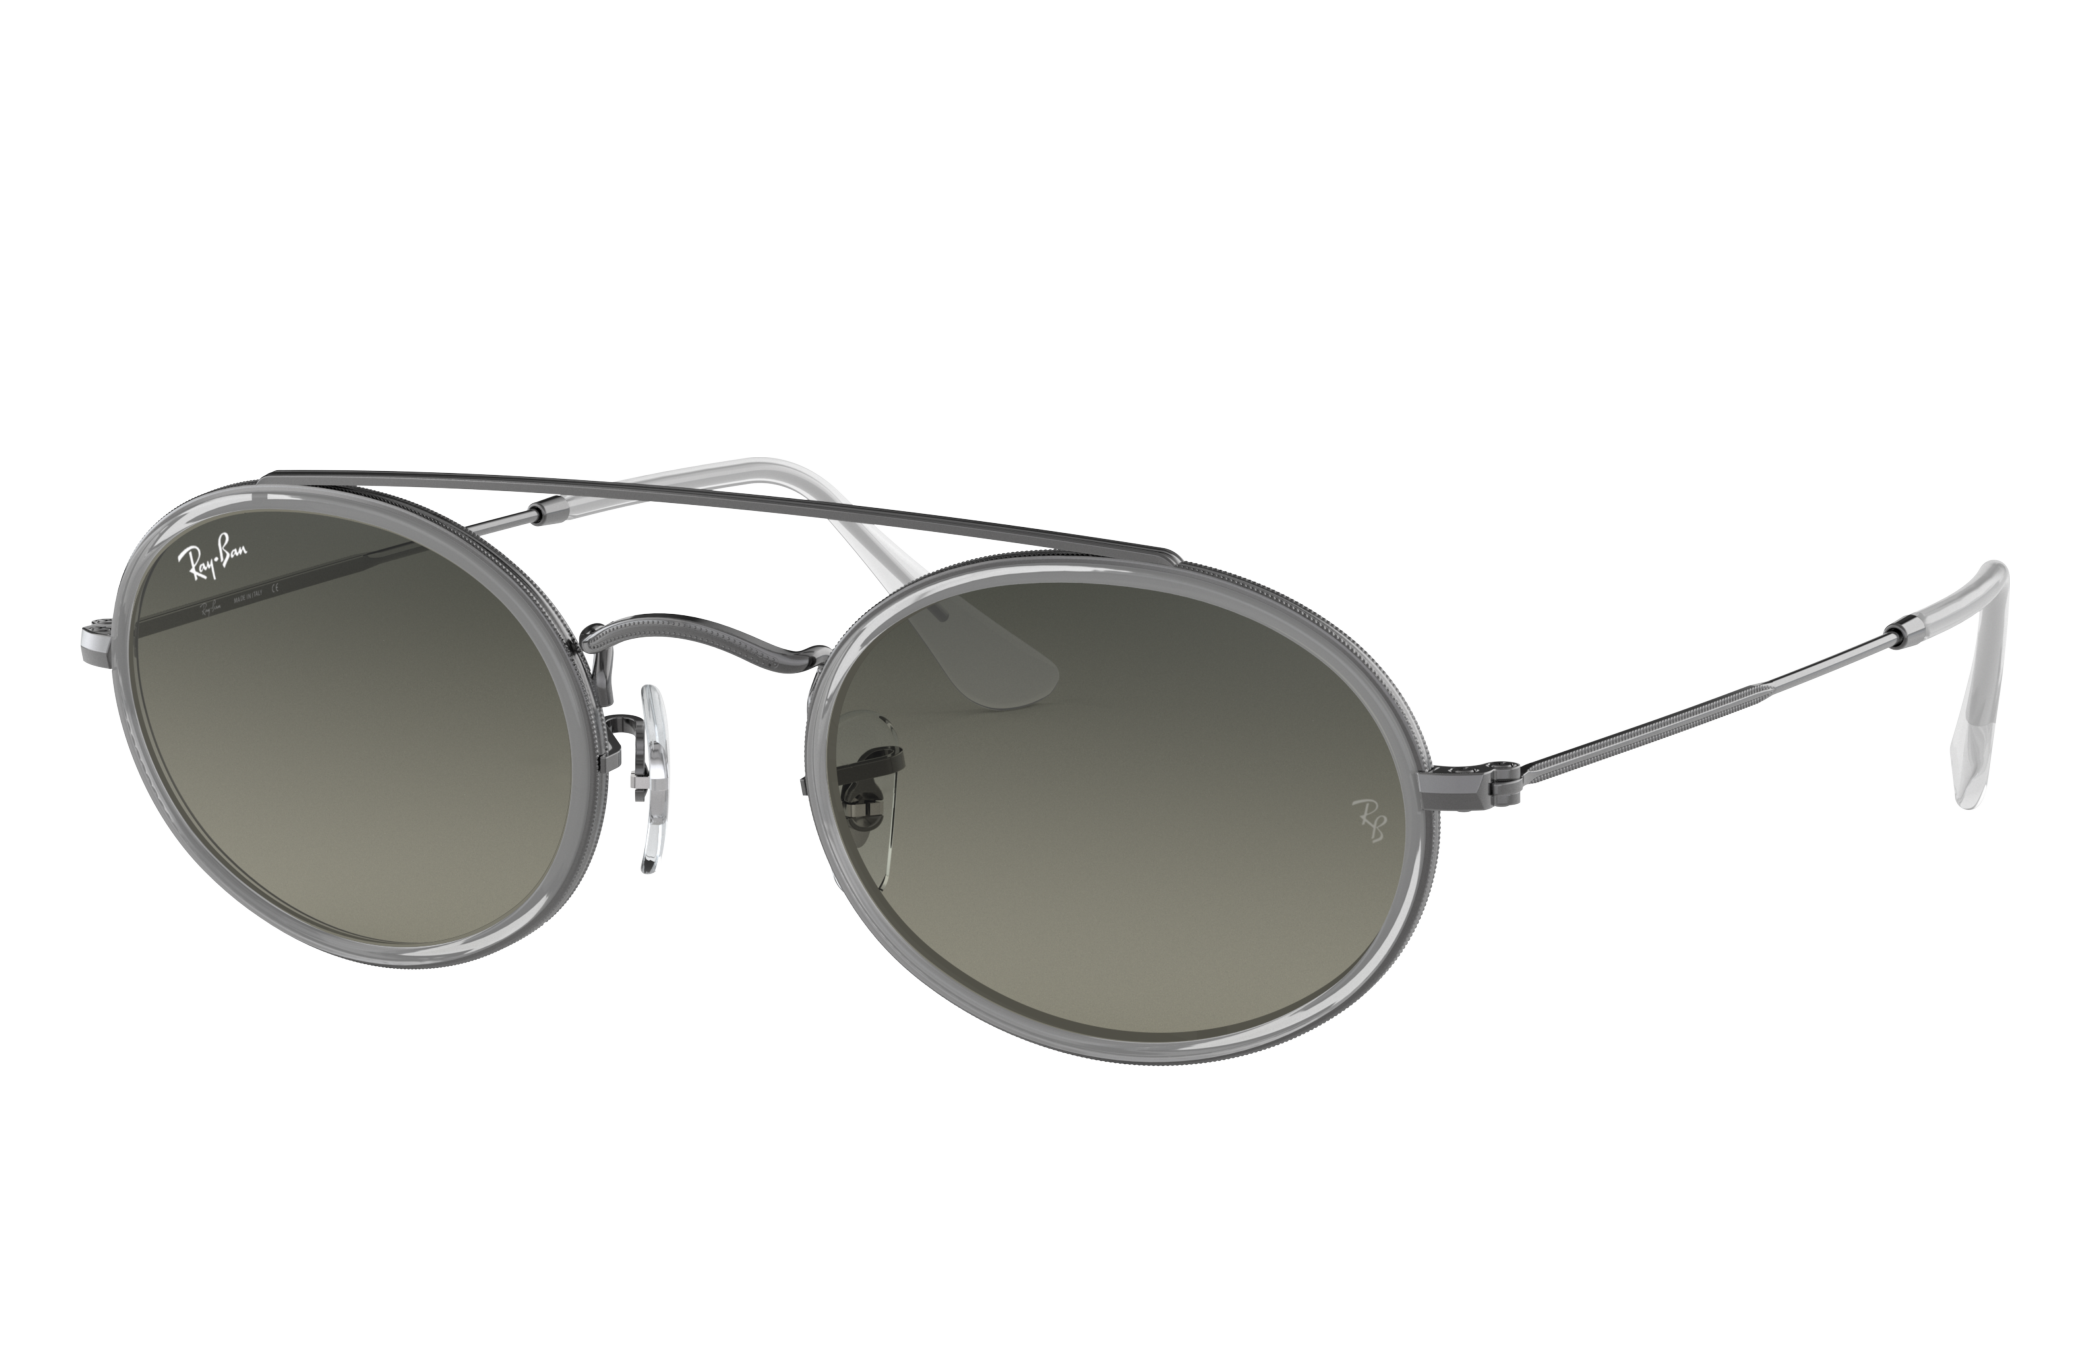 Ray-Ban Oval Double Bridge Gunmetal, Gray Lenses - RB3847N